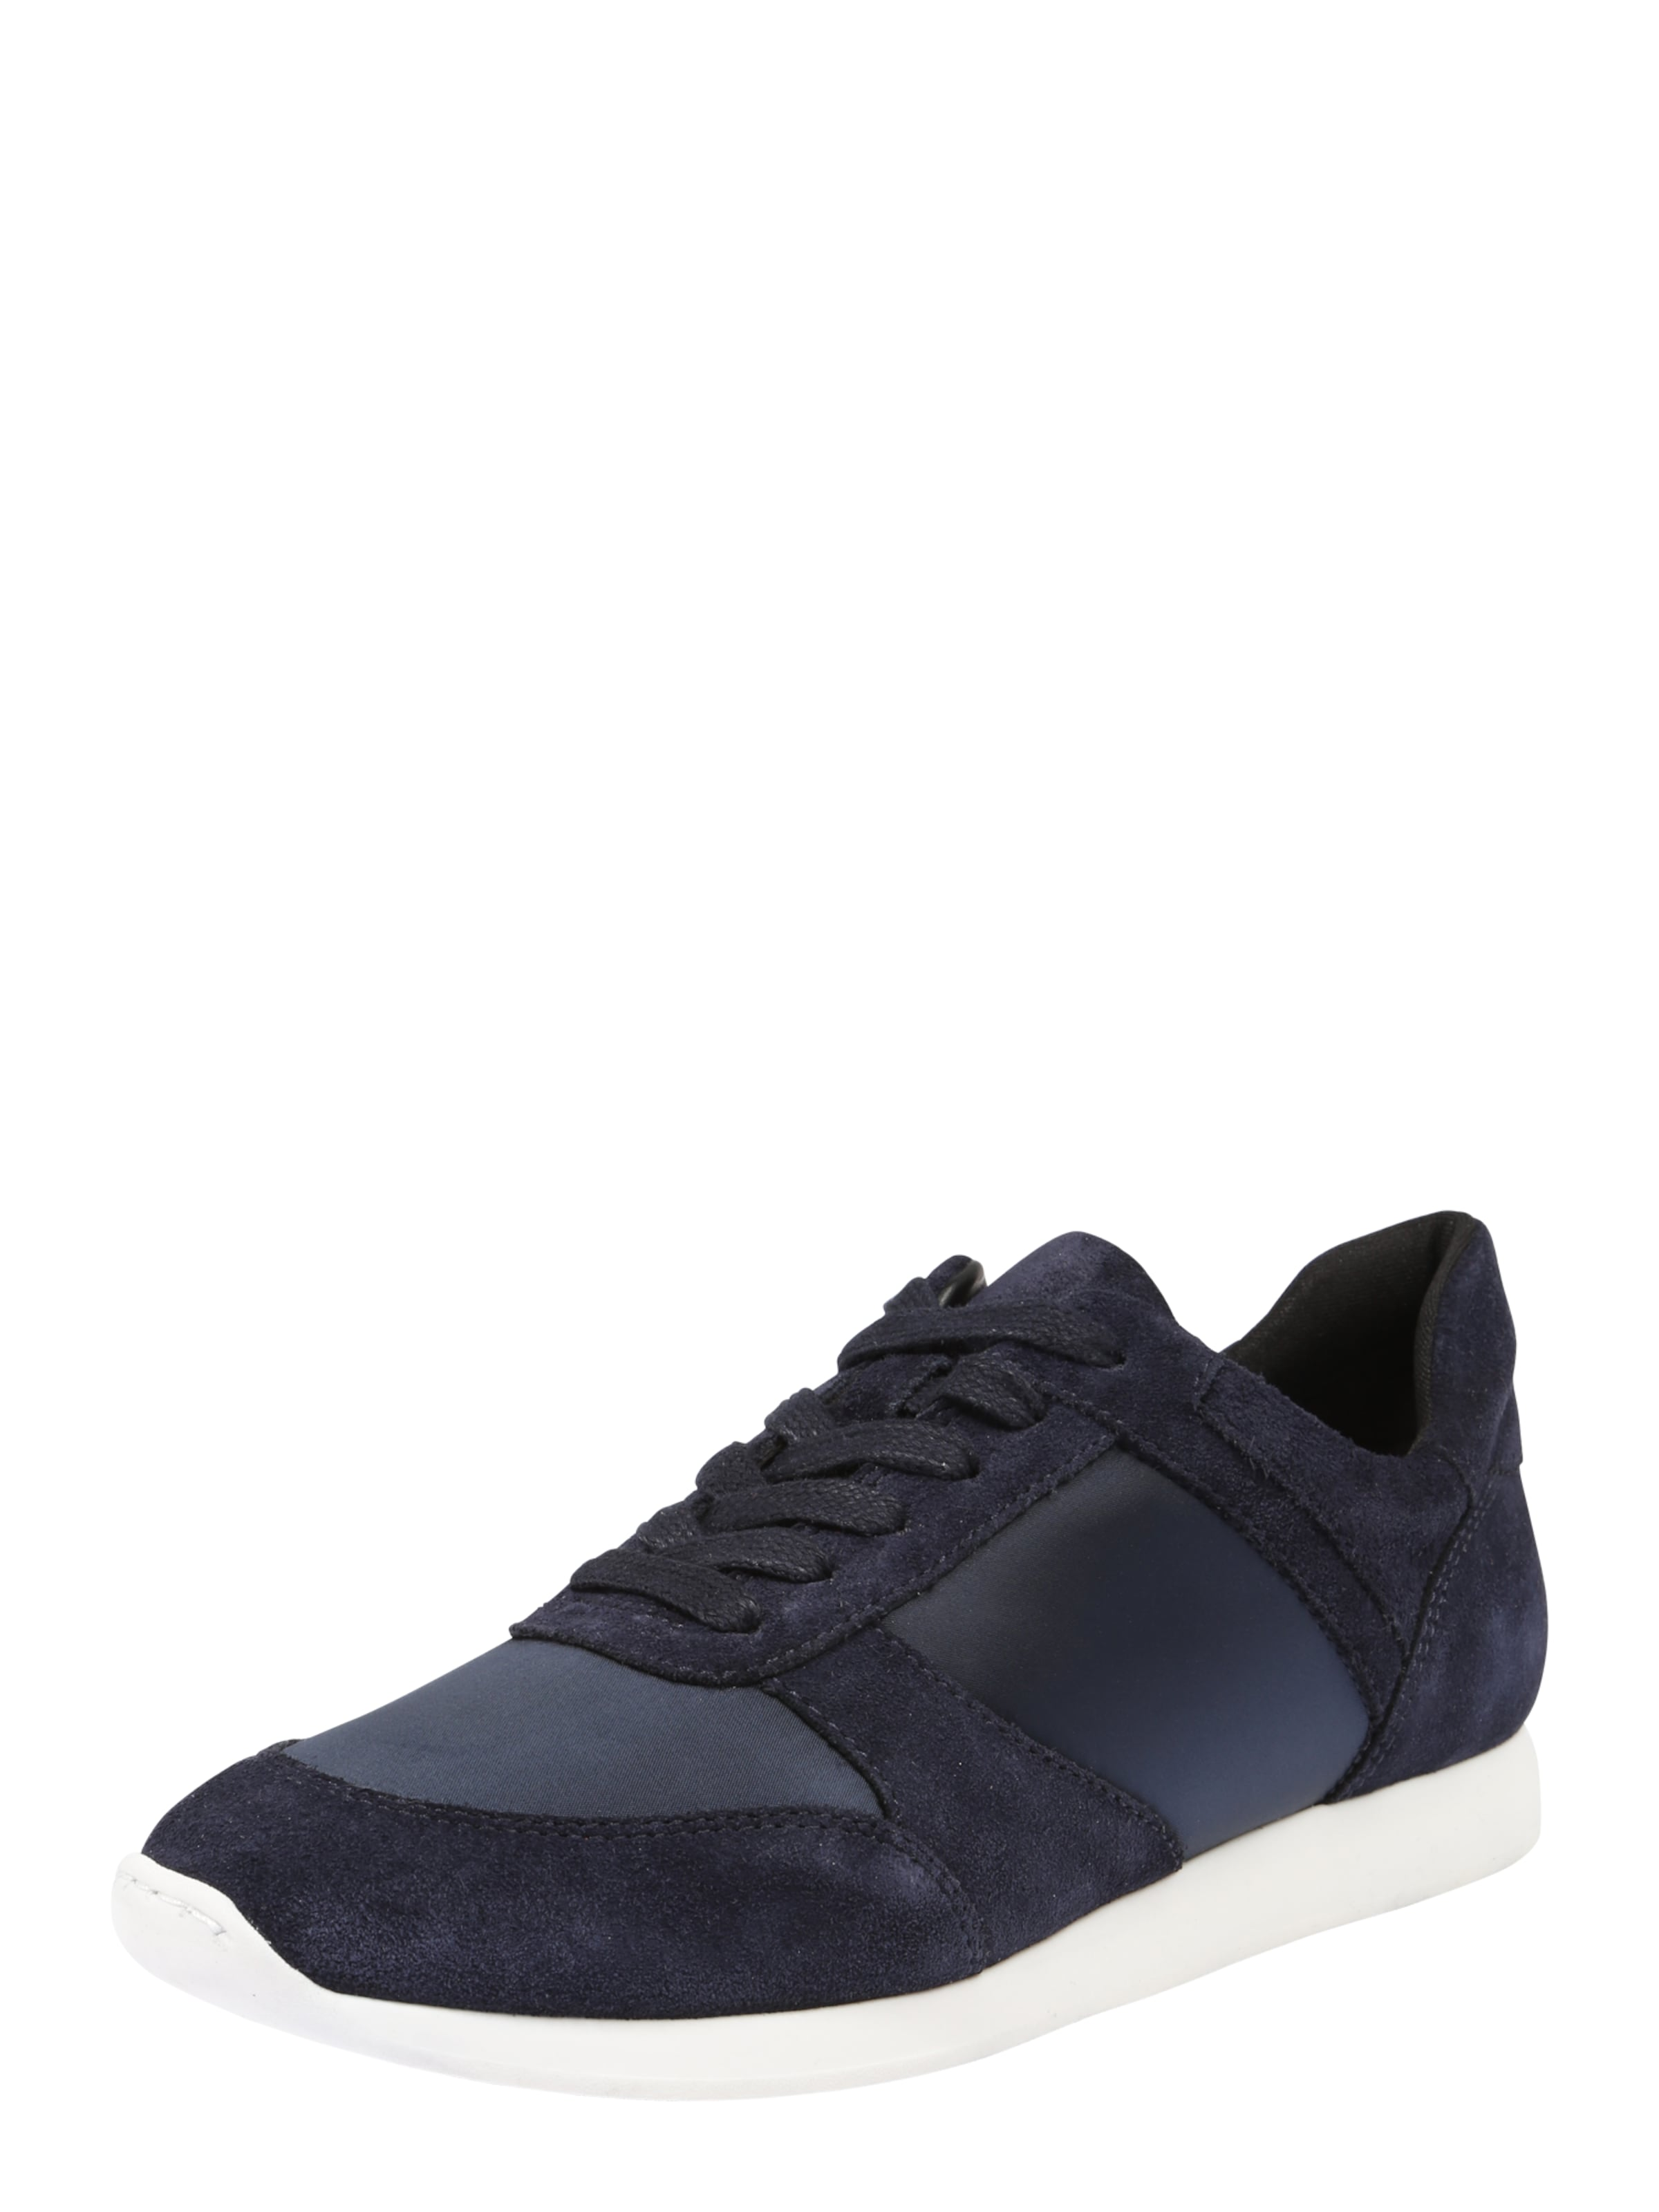 VAGABOND SHOEMAKERS Sneaker Kasai Verschleißfeste billige Schuhe